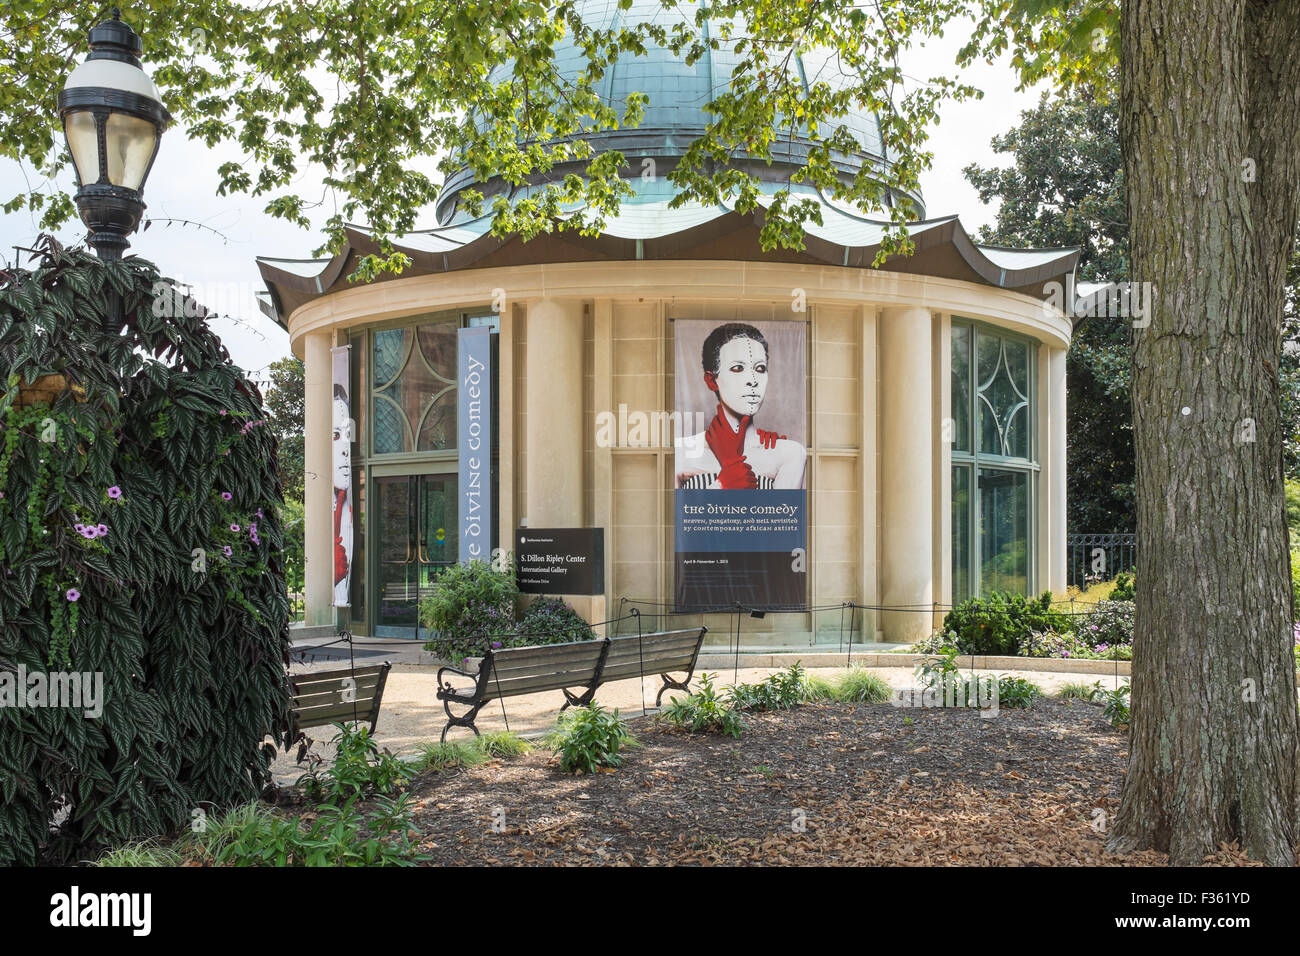 Le Smithsonian S Dillon Ripley Center au Smithsonian Institute on National Mall à Washington DC Photo Stock